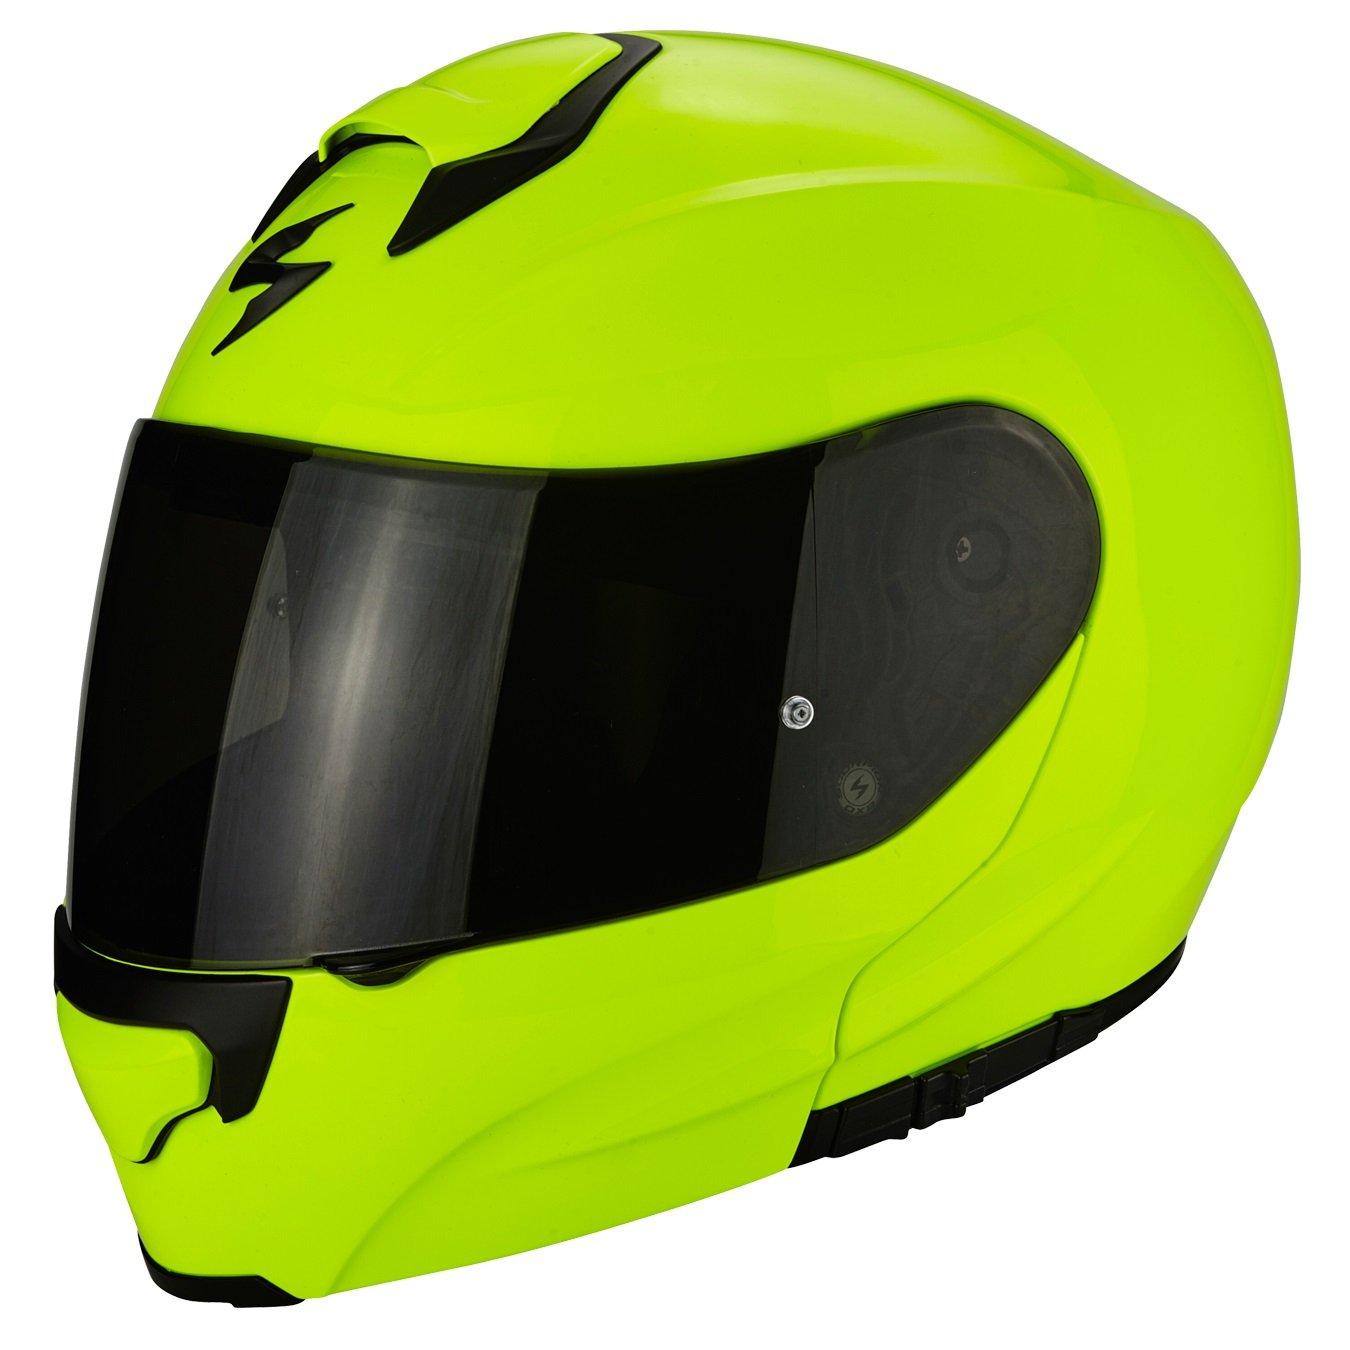 Scorpion EXO 3000 AIR Solid žlutá fluo L (59/60)